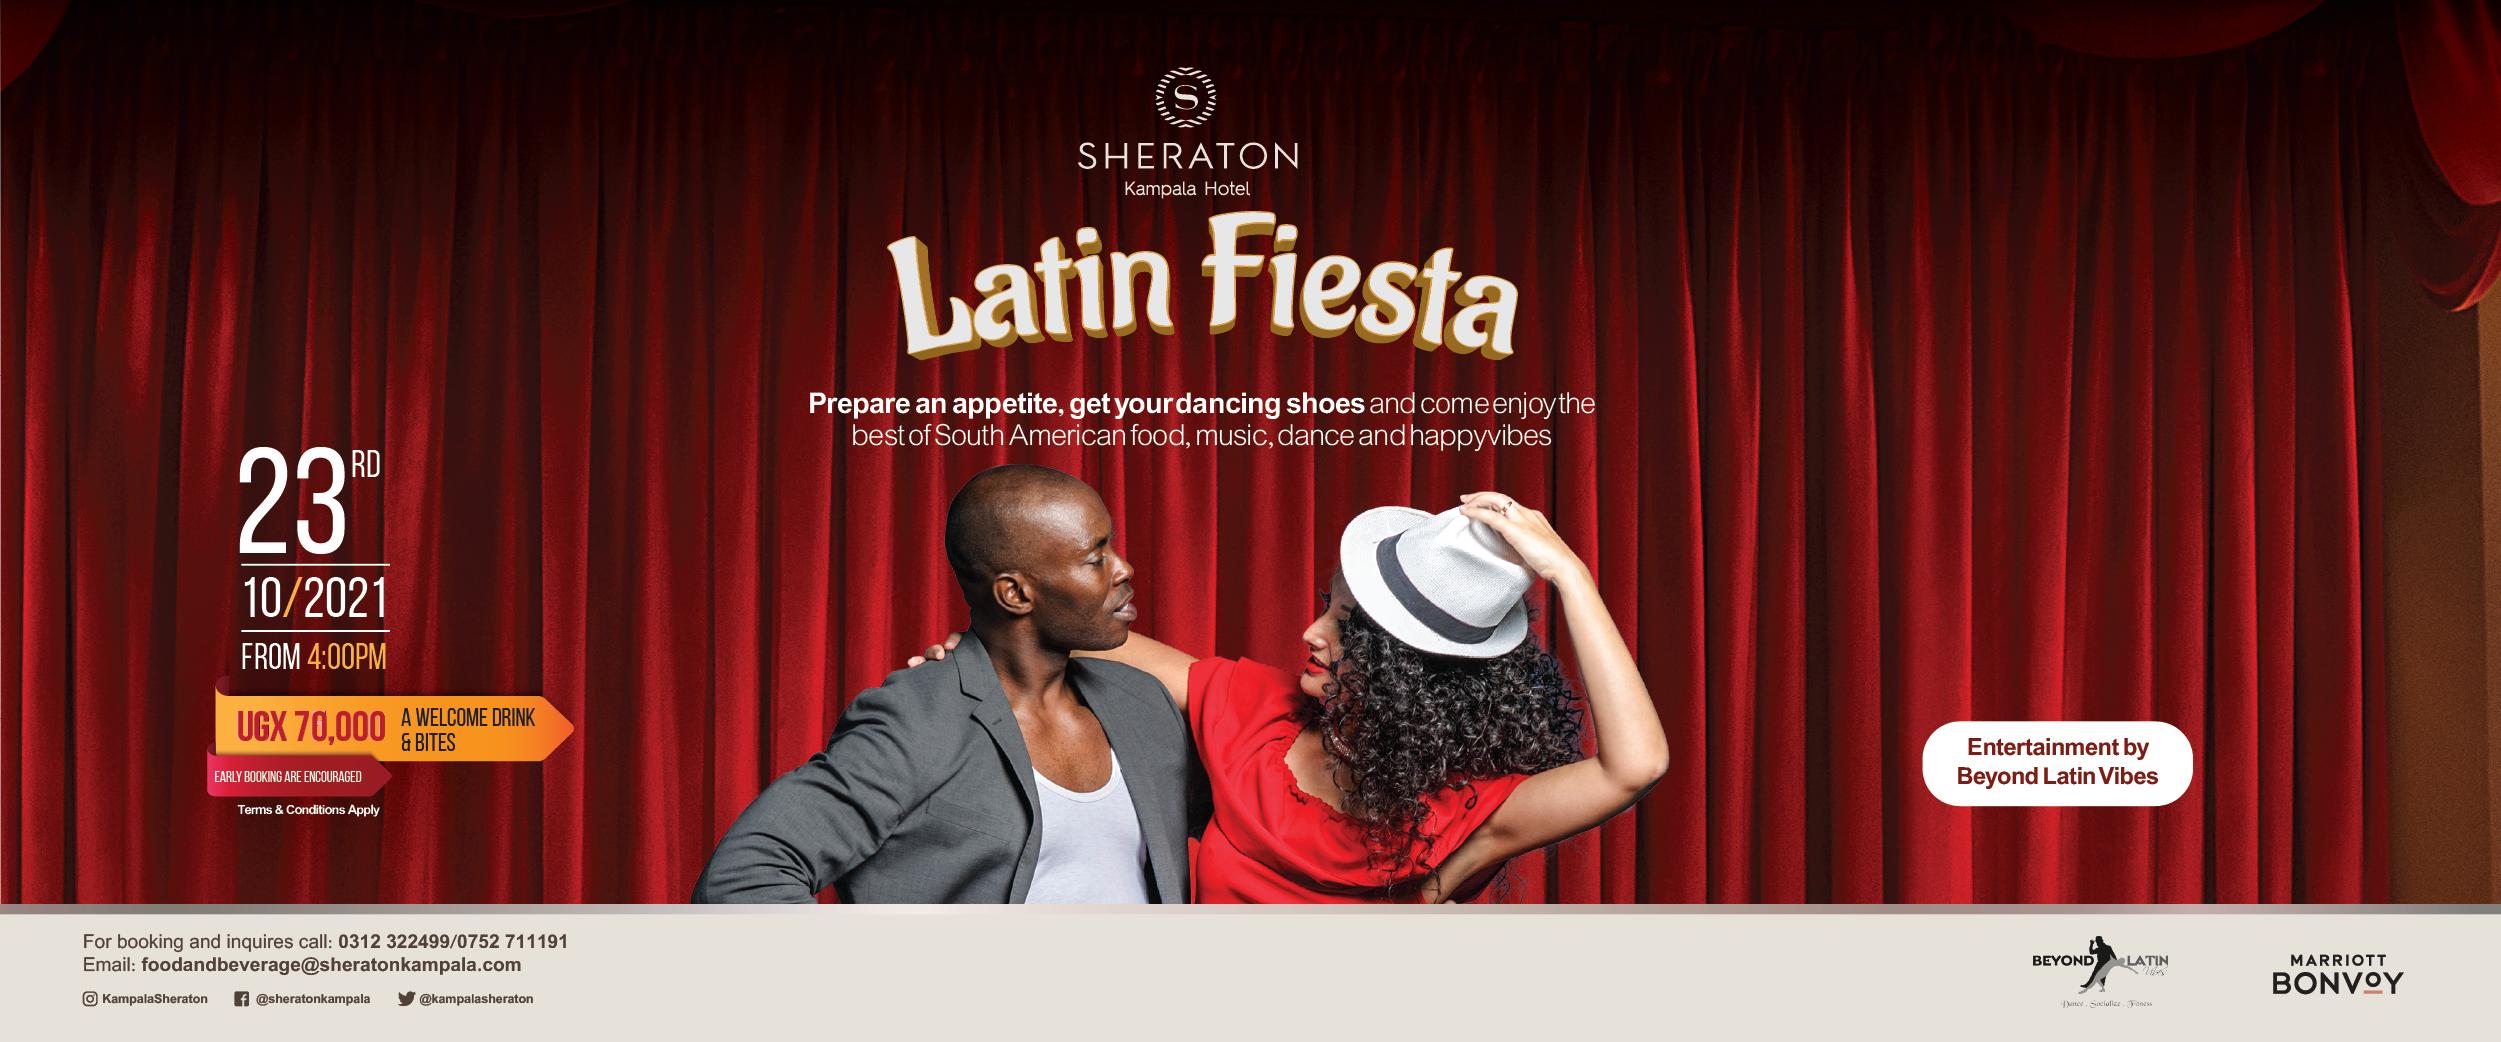 Don't miss the Latin Fiesta at the Sheraton Kampala Hotel